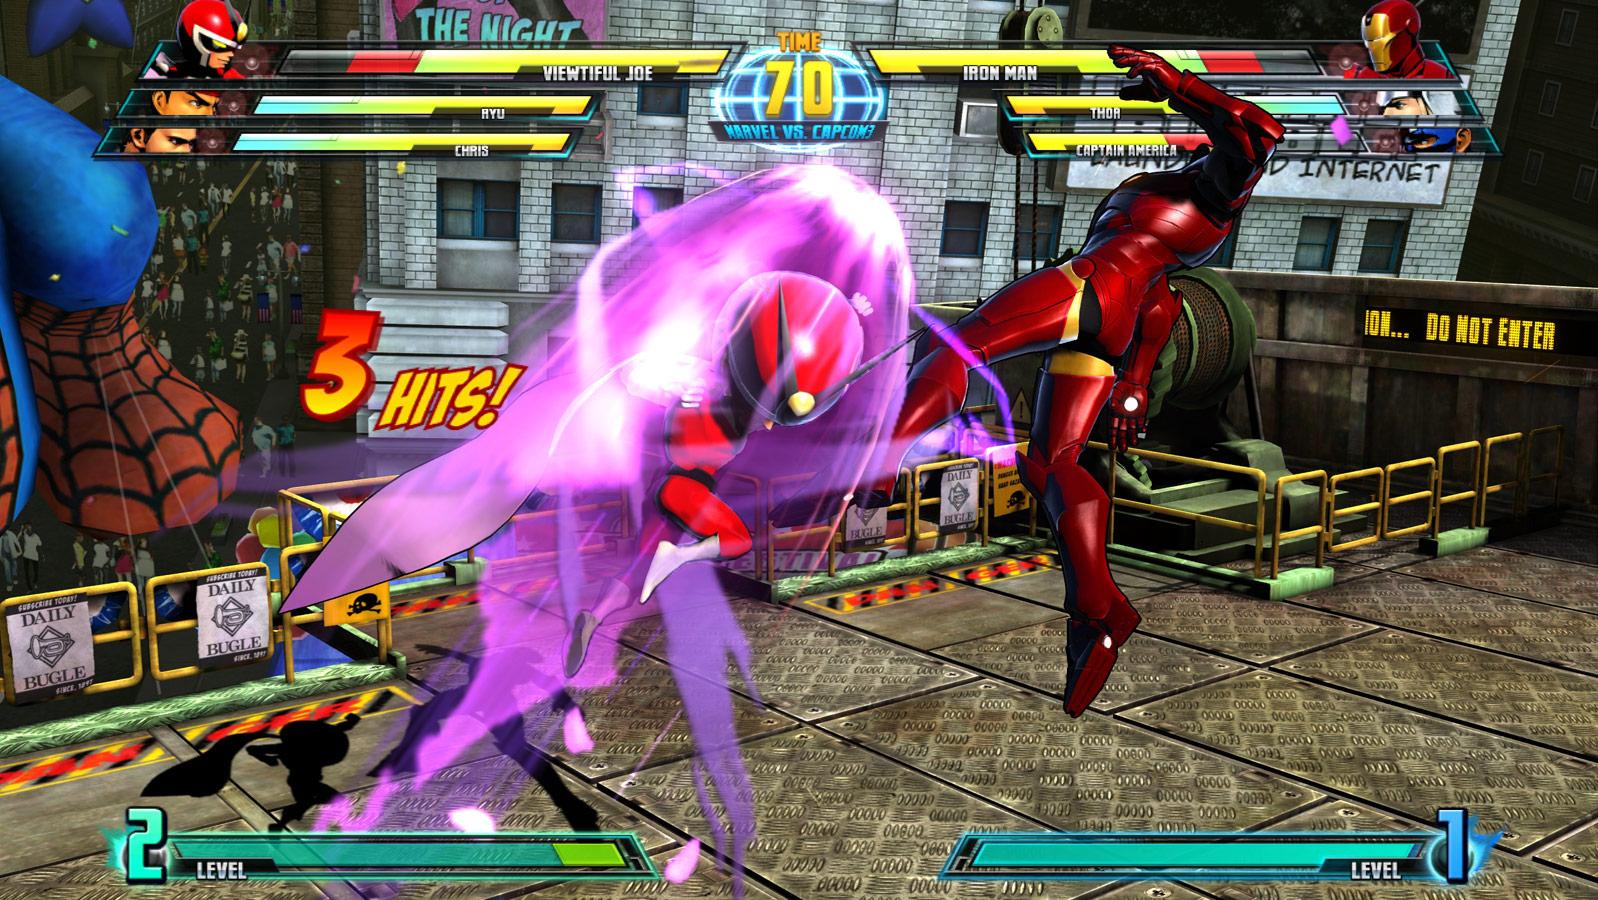 Marvel vs. Capcom 3 screen shot Aug. 18 image #9